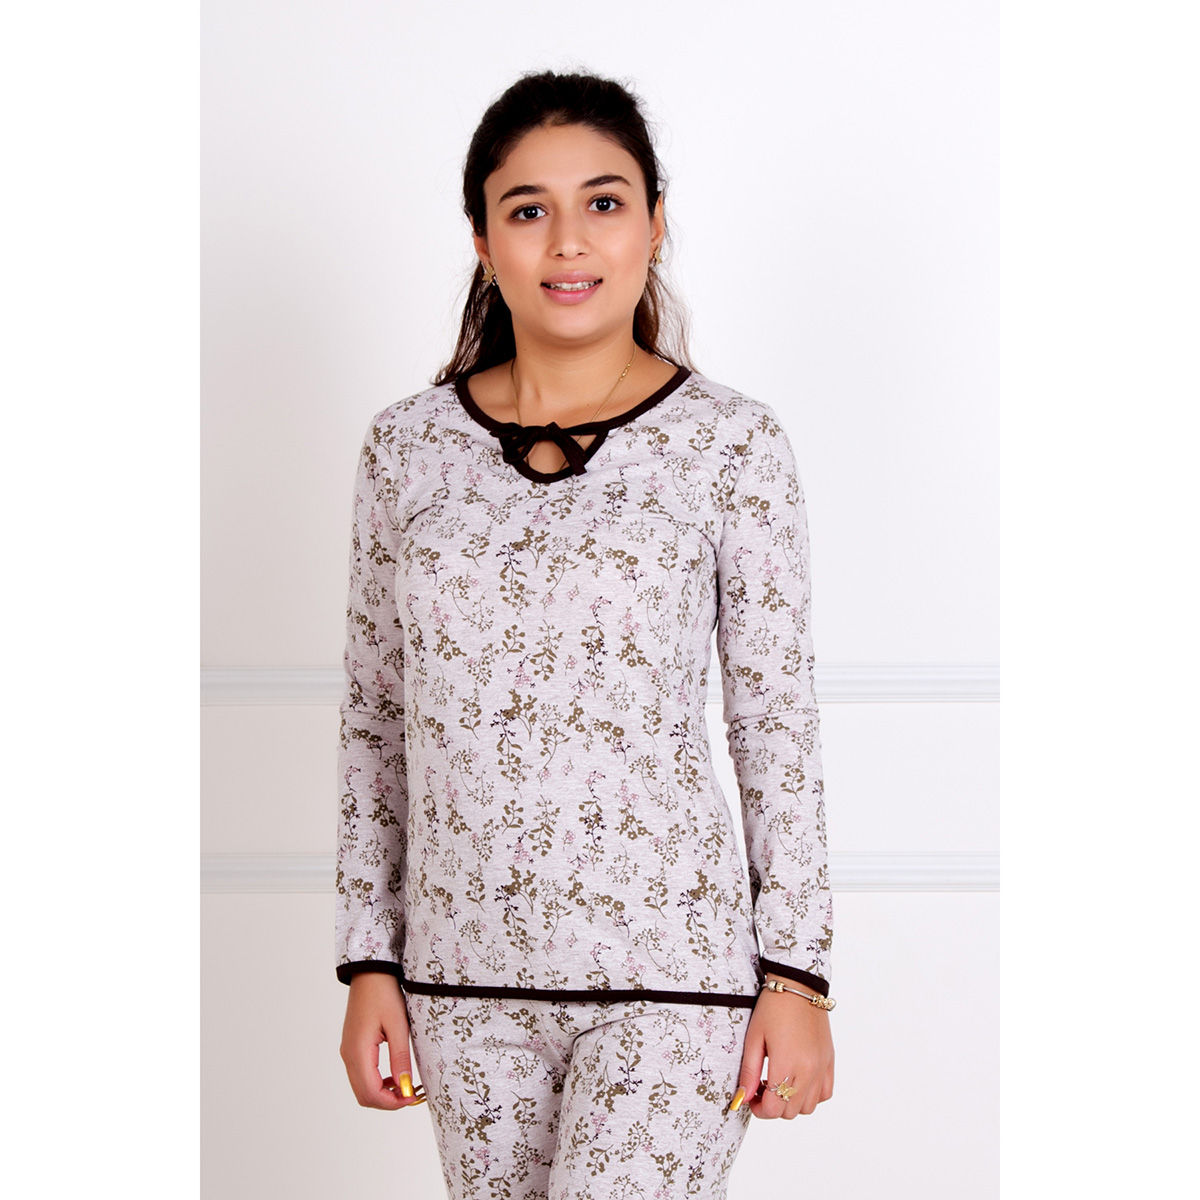 Женский пижама Веточки, размер 46Пижамы<br>Обхват груди:92 см<br>Обхват талии:74 см<br>Обхват бедер:100 см<br>Рост:167 см<br><br>Тип: Жен. костюм<br>Размер: 46<br>Материал: Кулирка